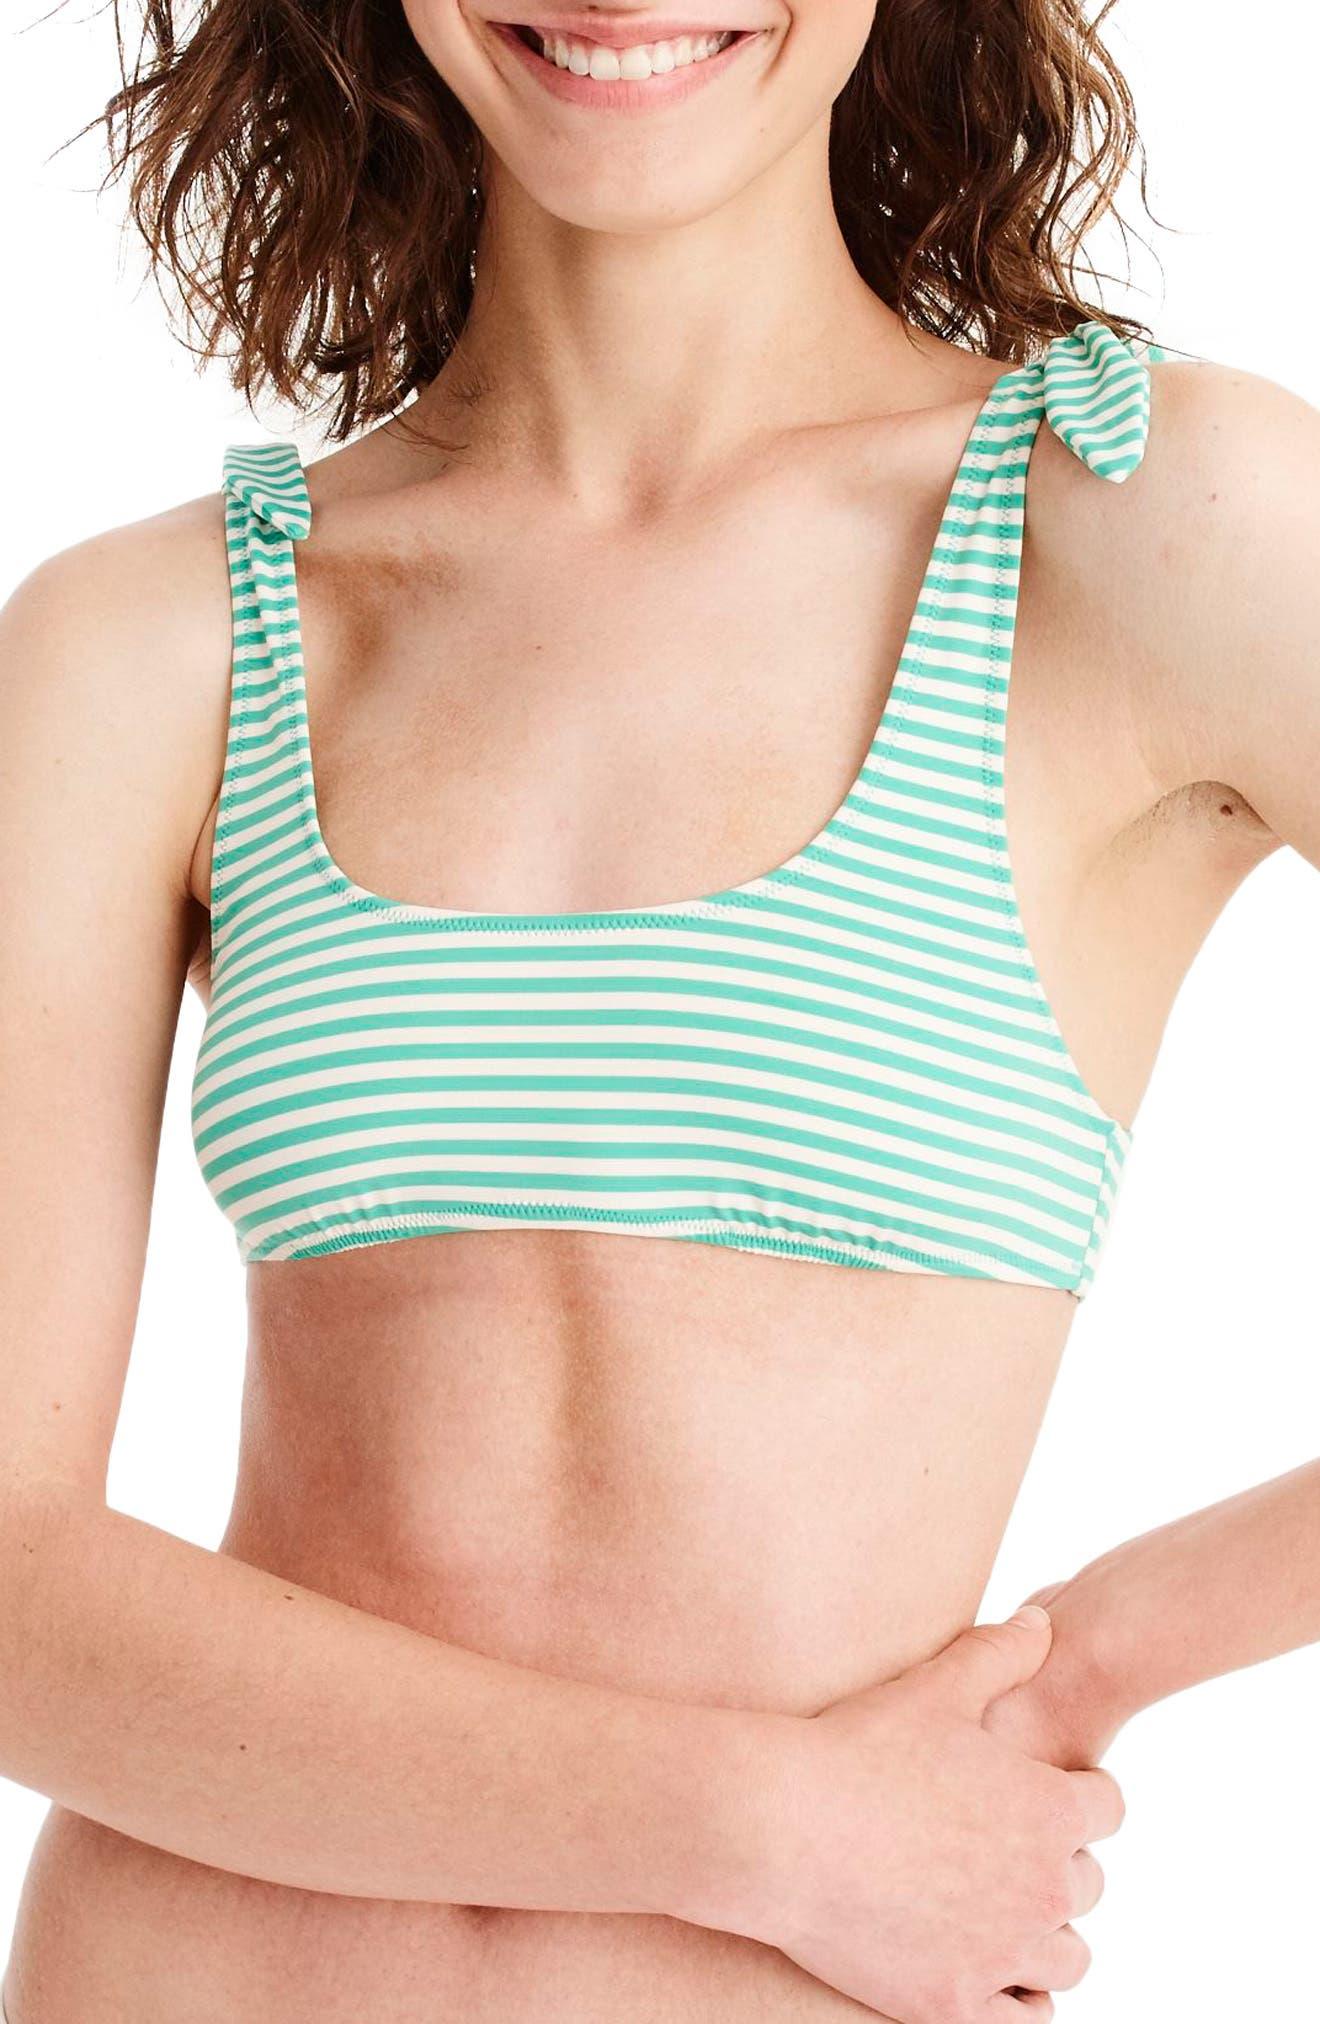 Playa Nantucket Bikini Top,                         Main,                         color, Bright Patina Ivory